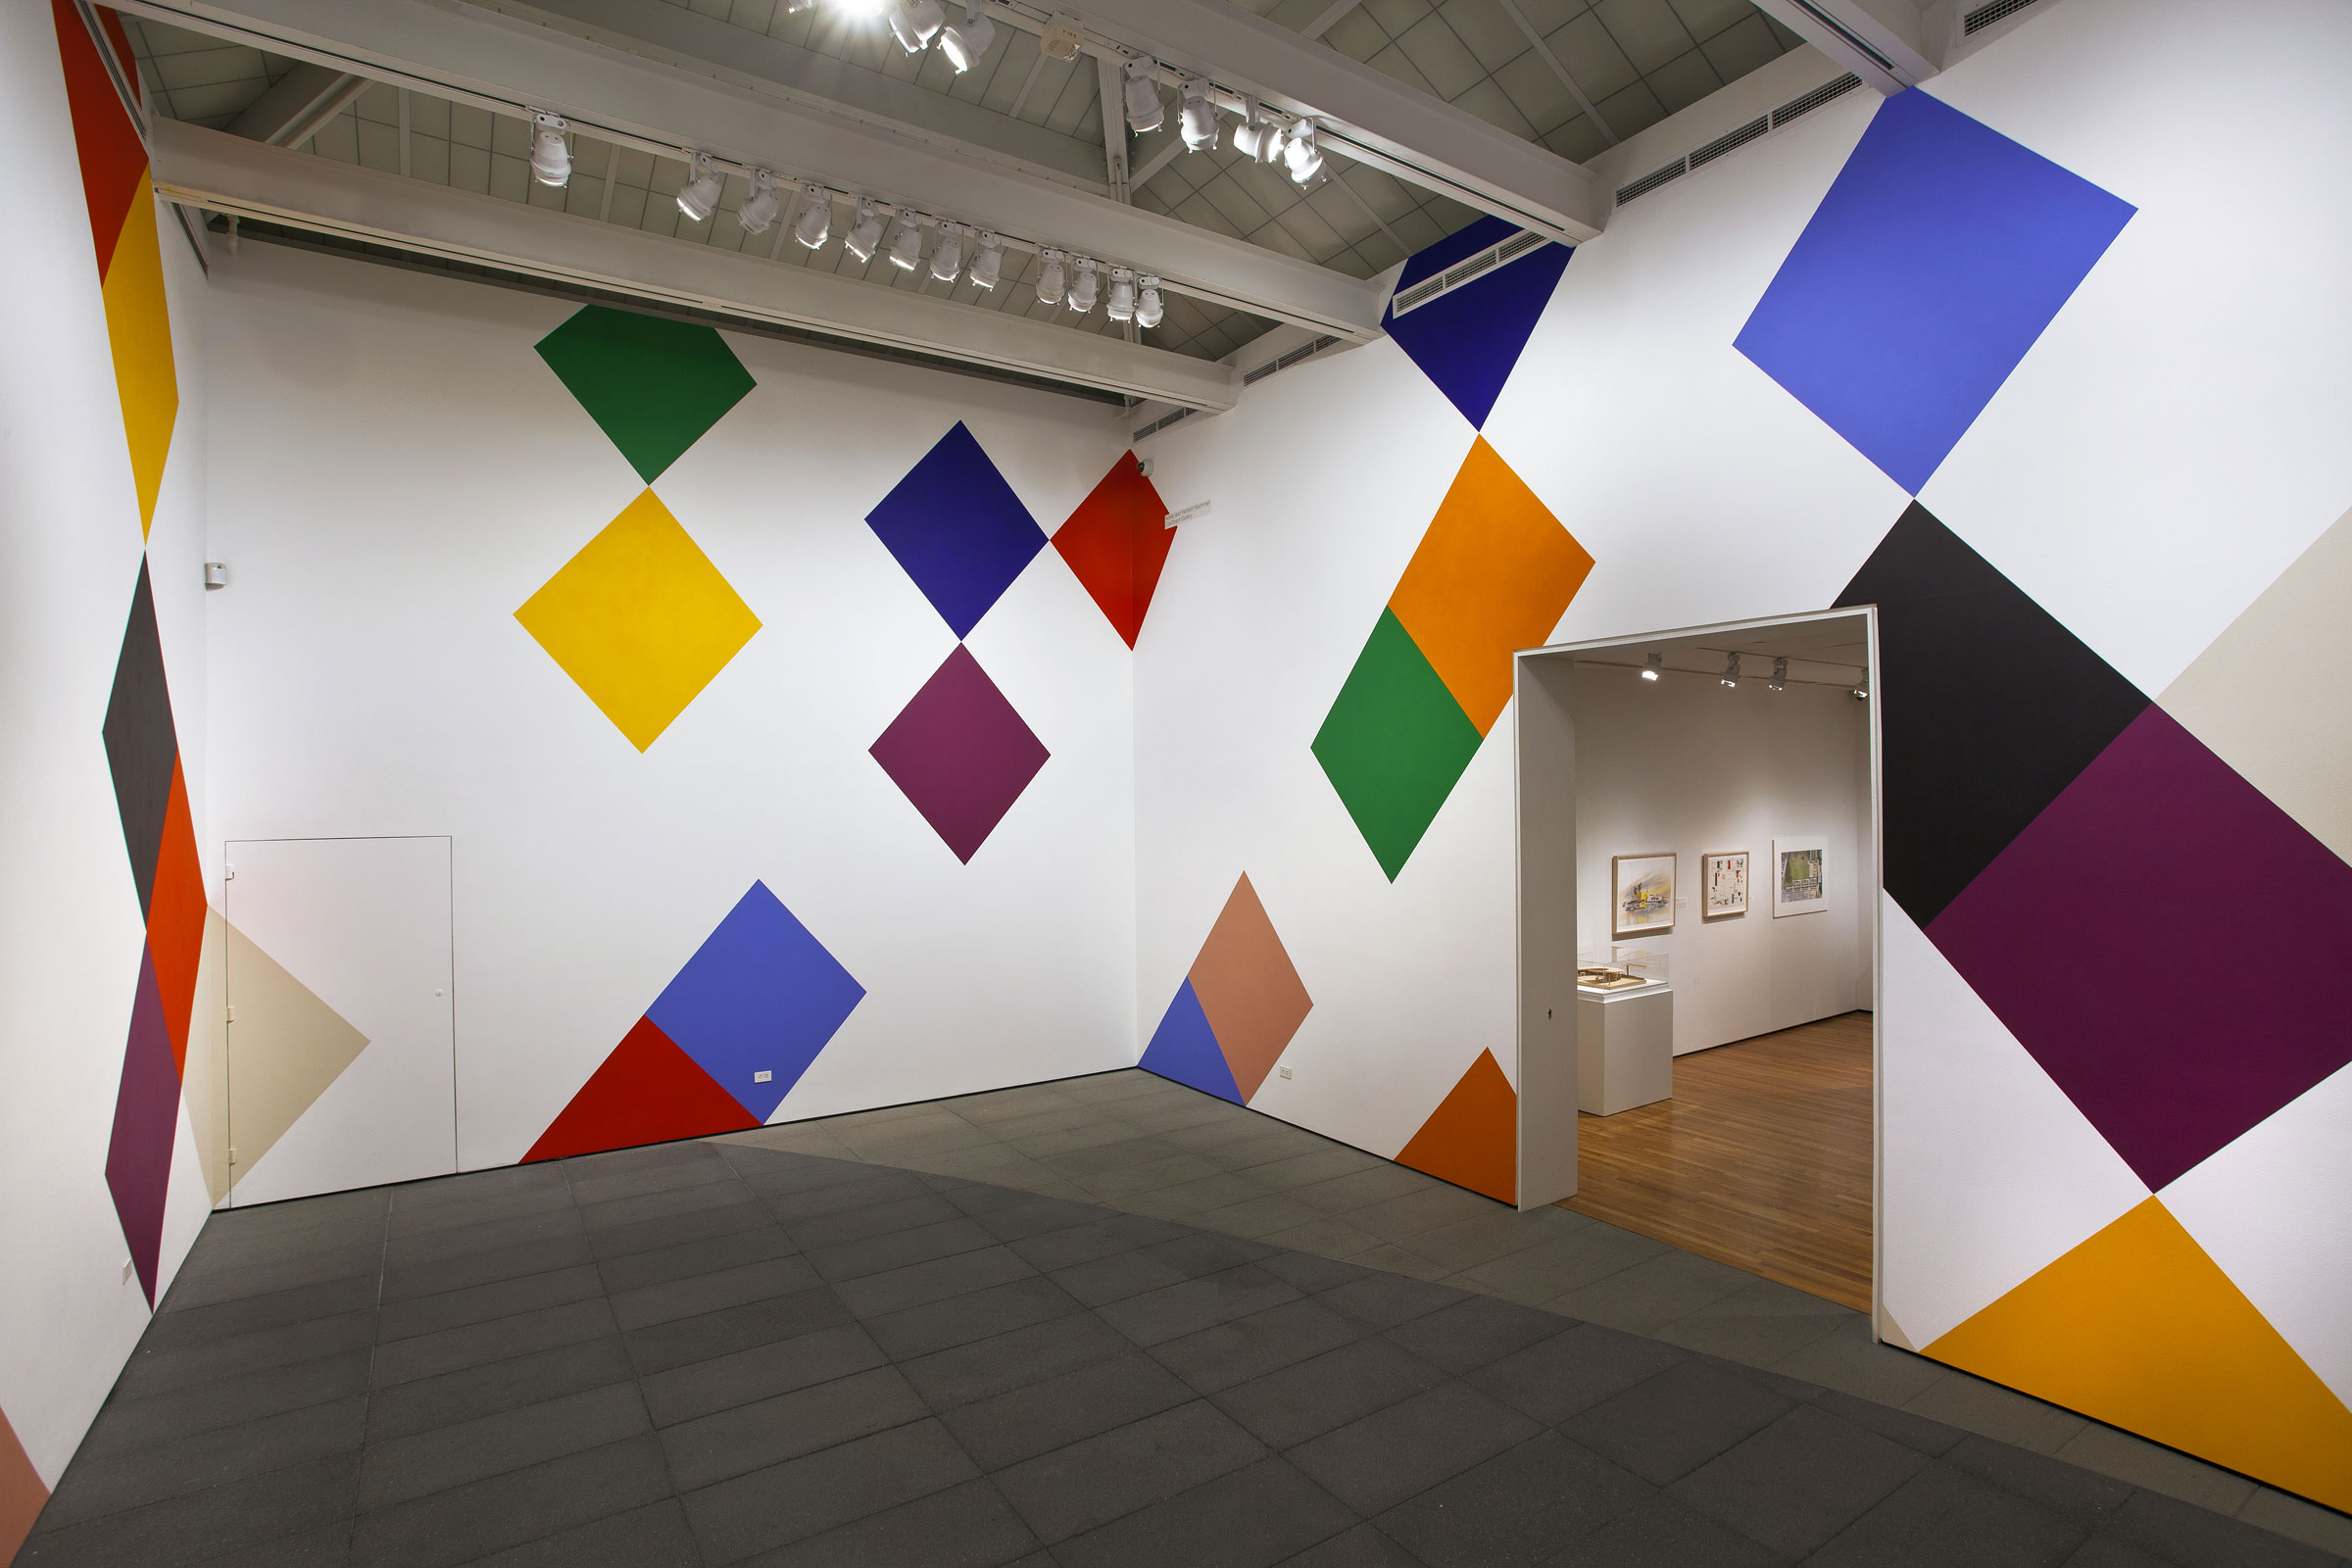 2015 Ucsb Nachman Gallery Stephen Westfall